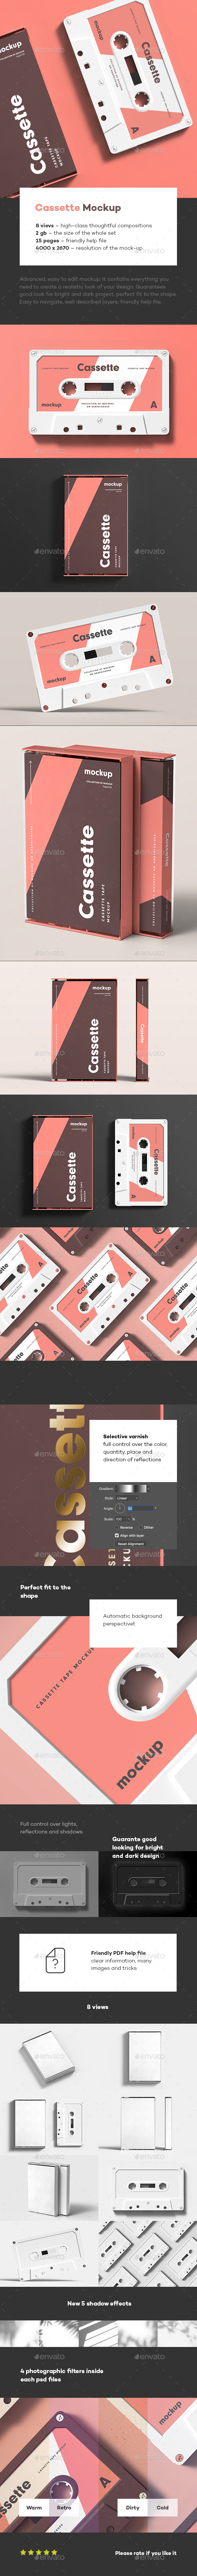 Cassette Mock-up